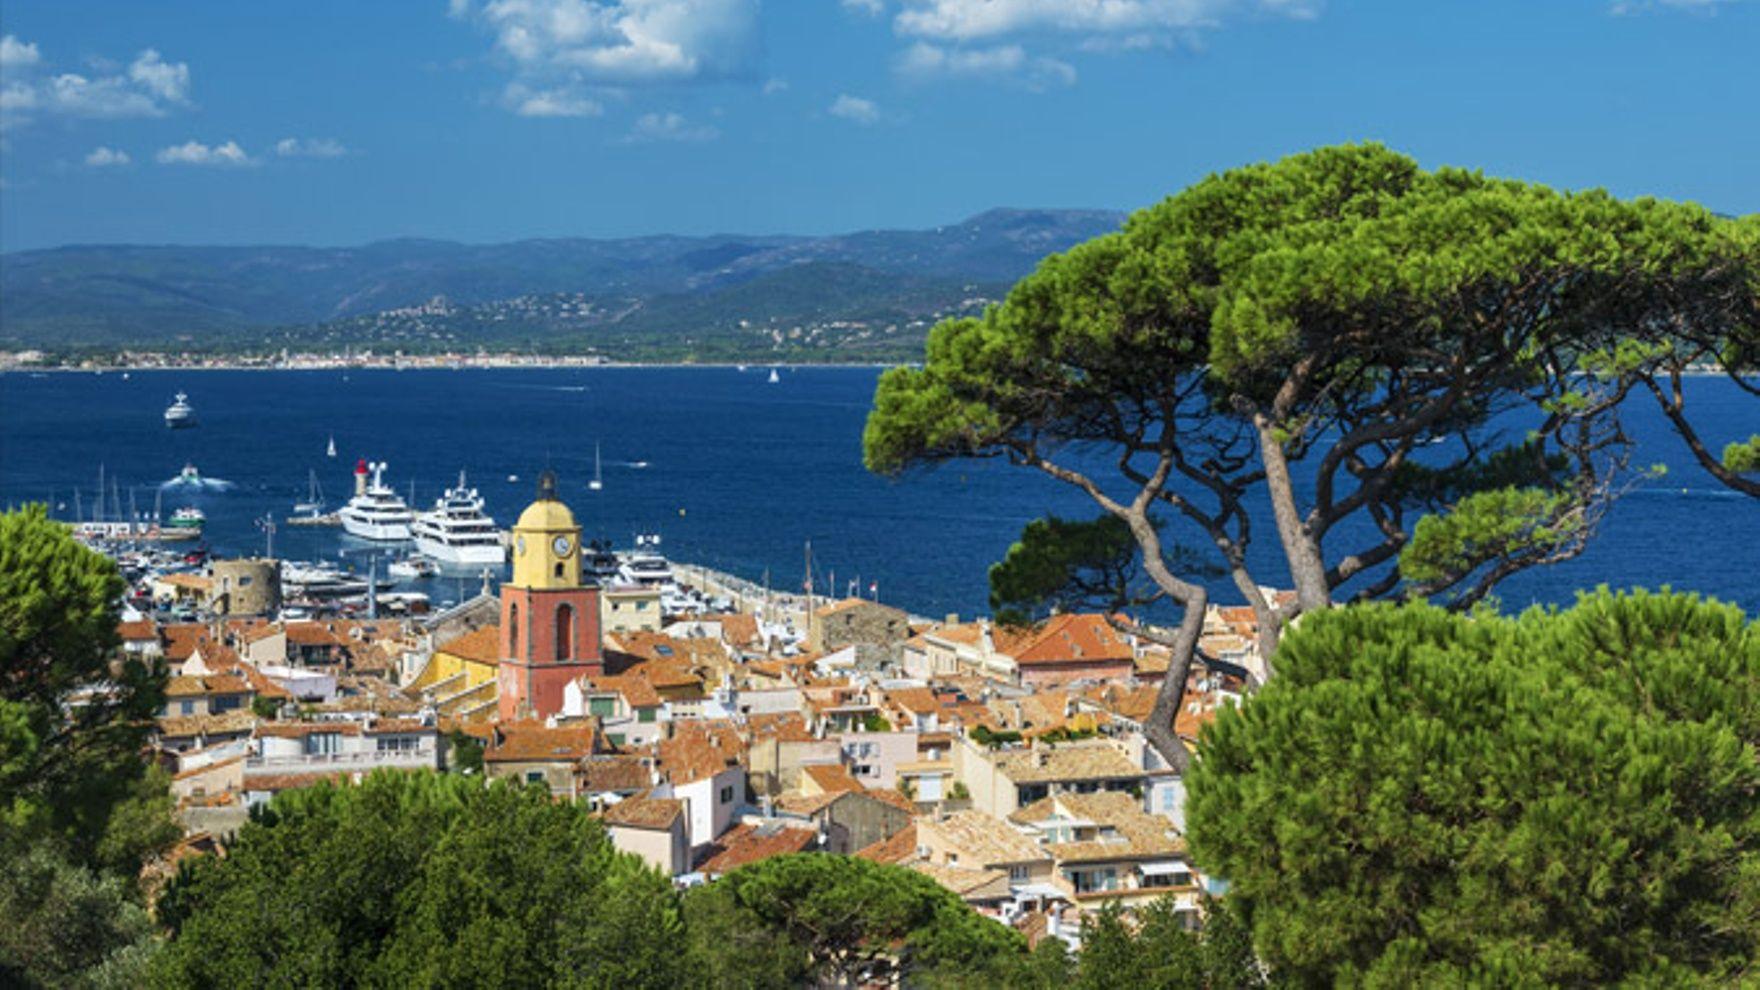 Saint Tropez Regatta 2019